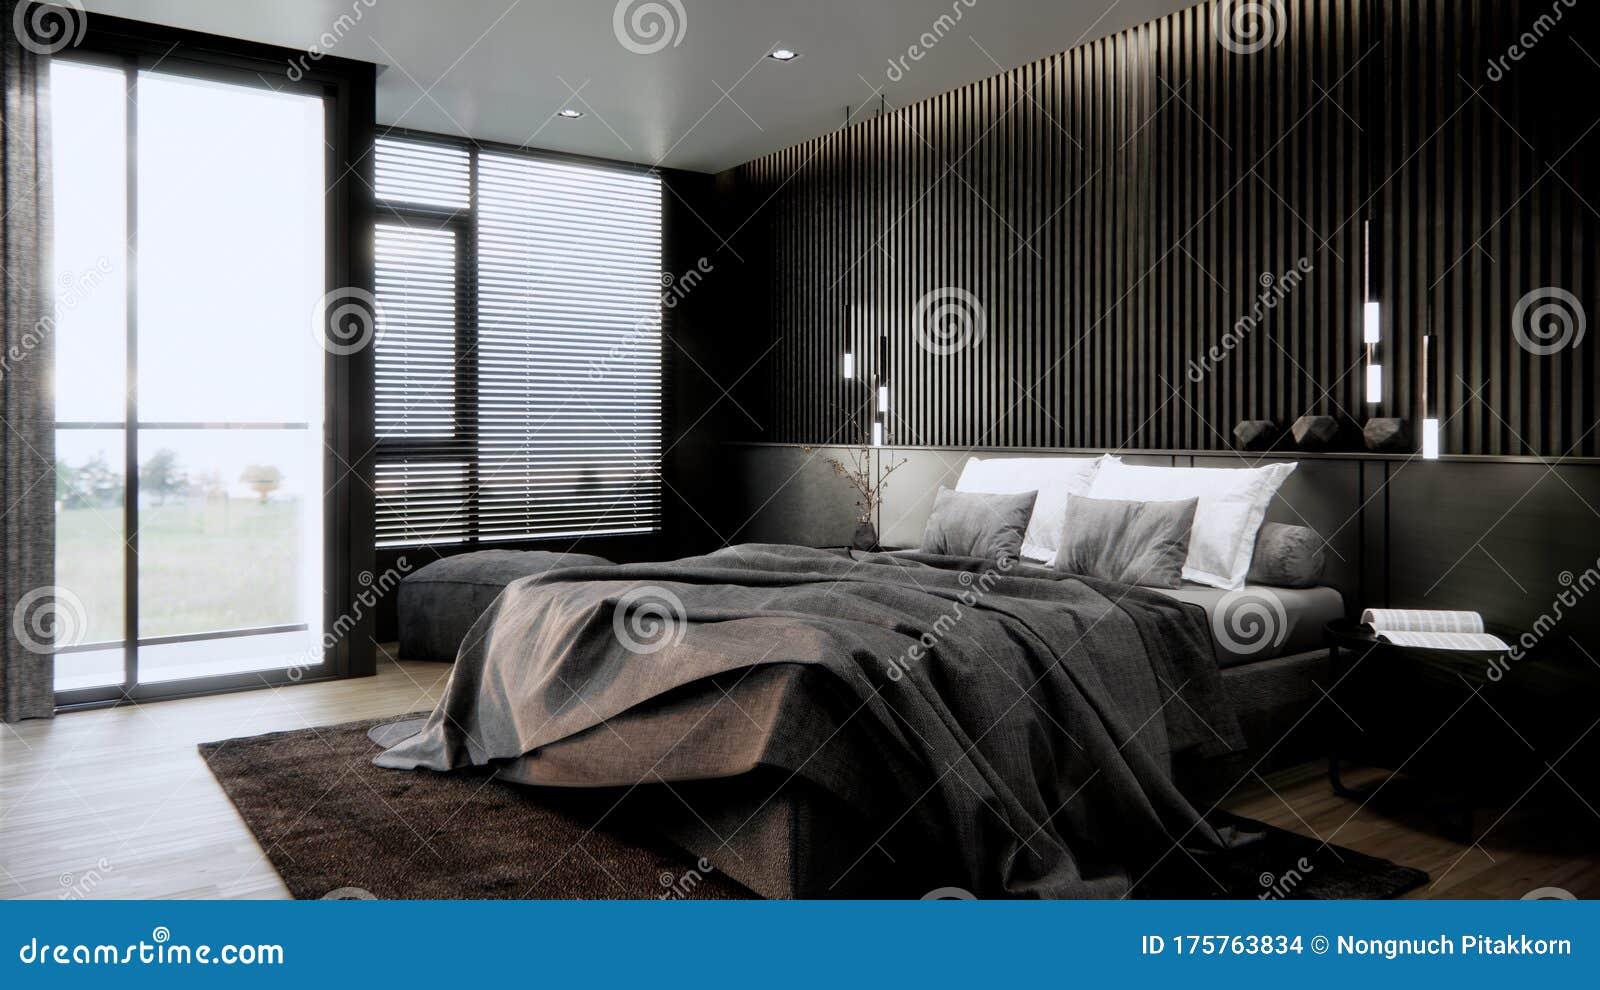 Black Modern Bedroom Interior Design With Furniture 3d Rendering Background Stock Illustration Illustration Of Interior Apartment 175763834